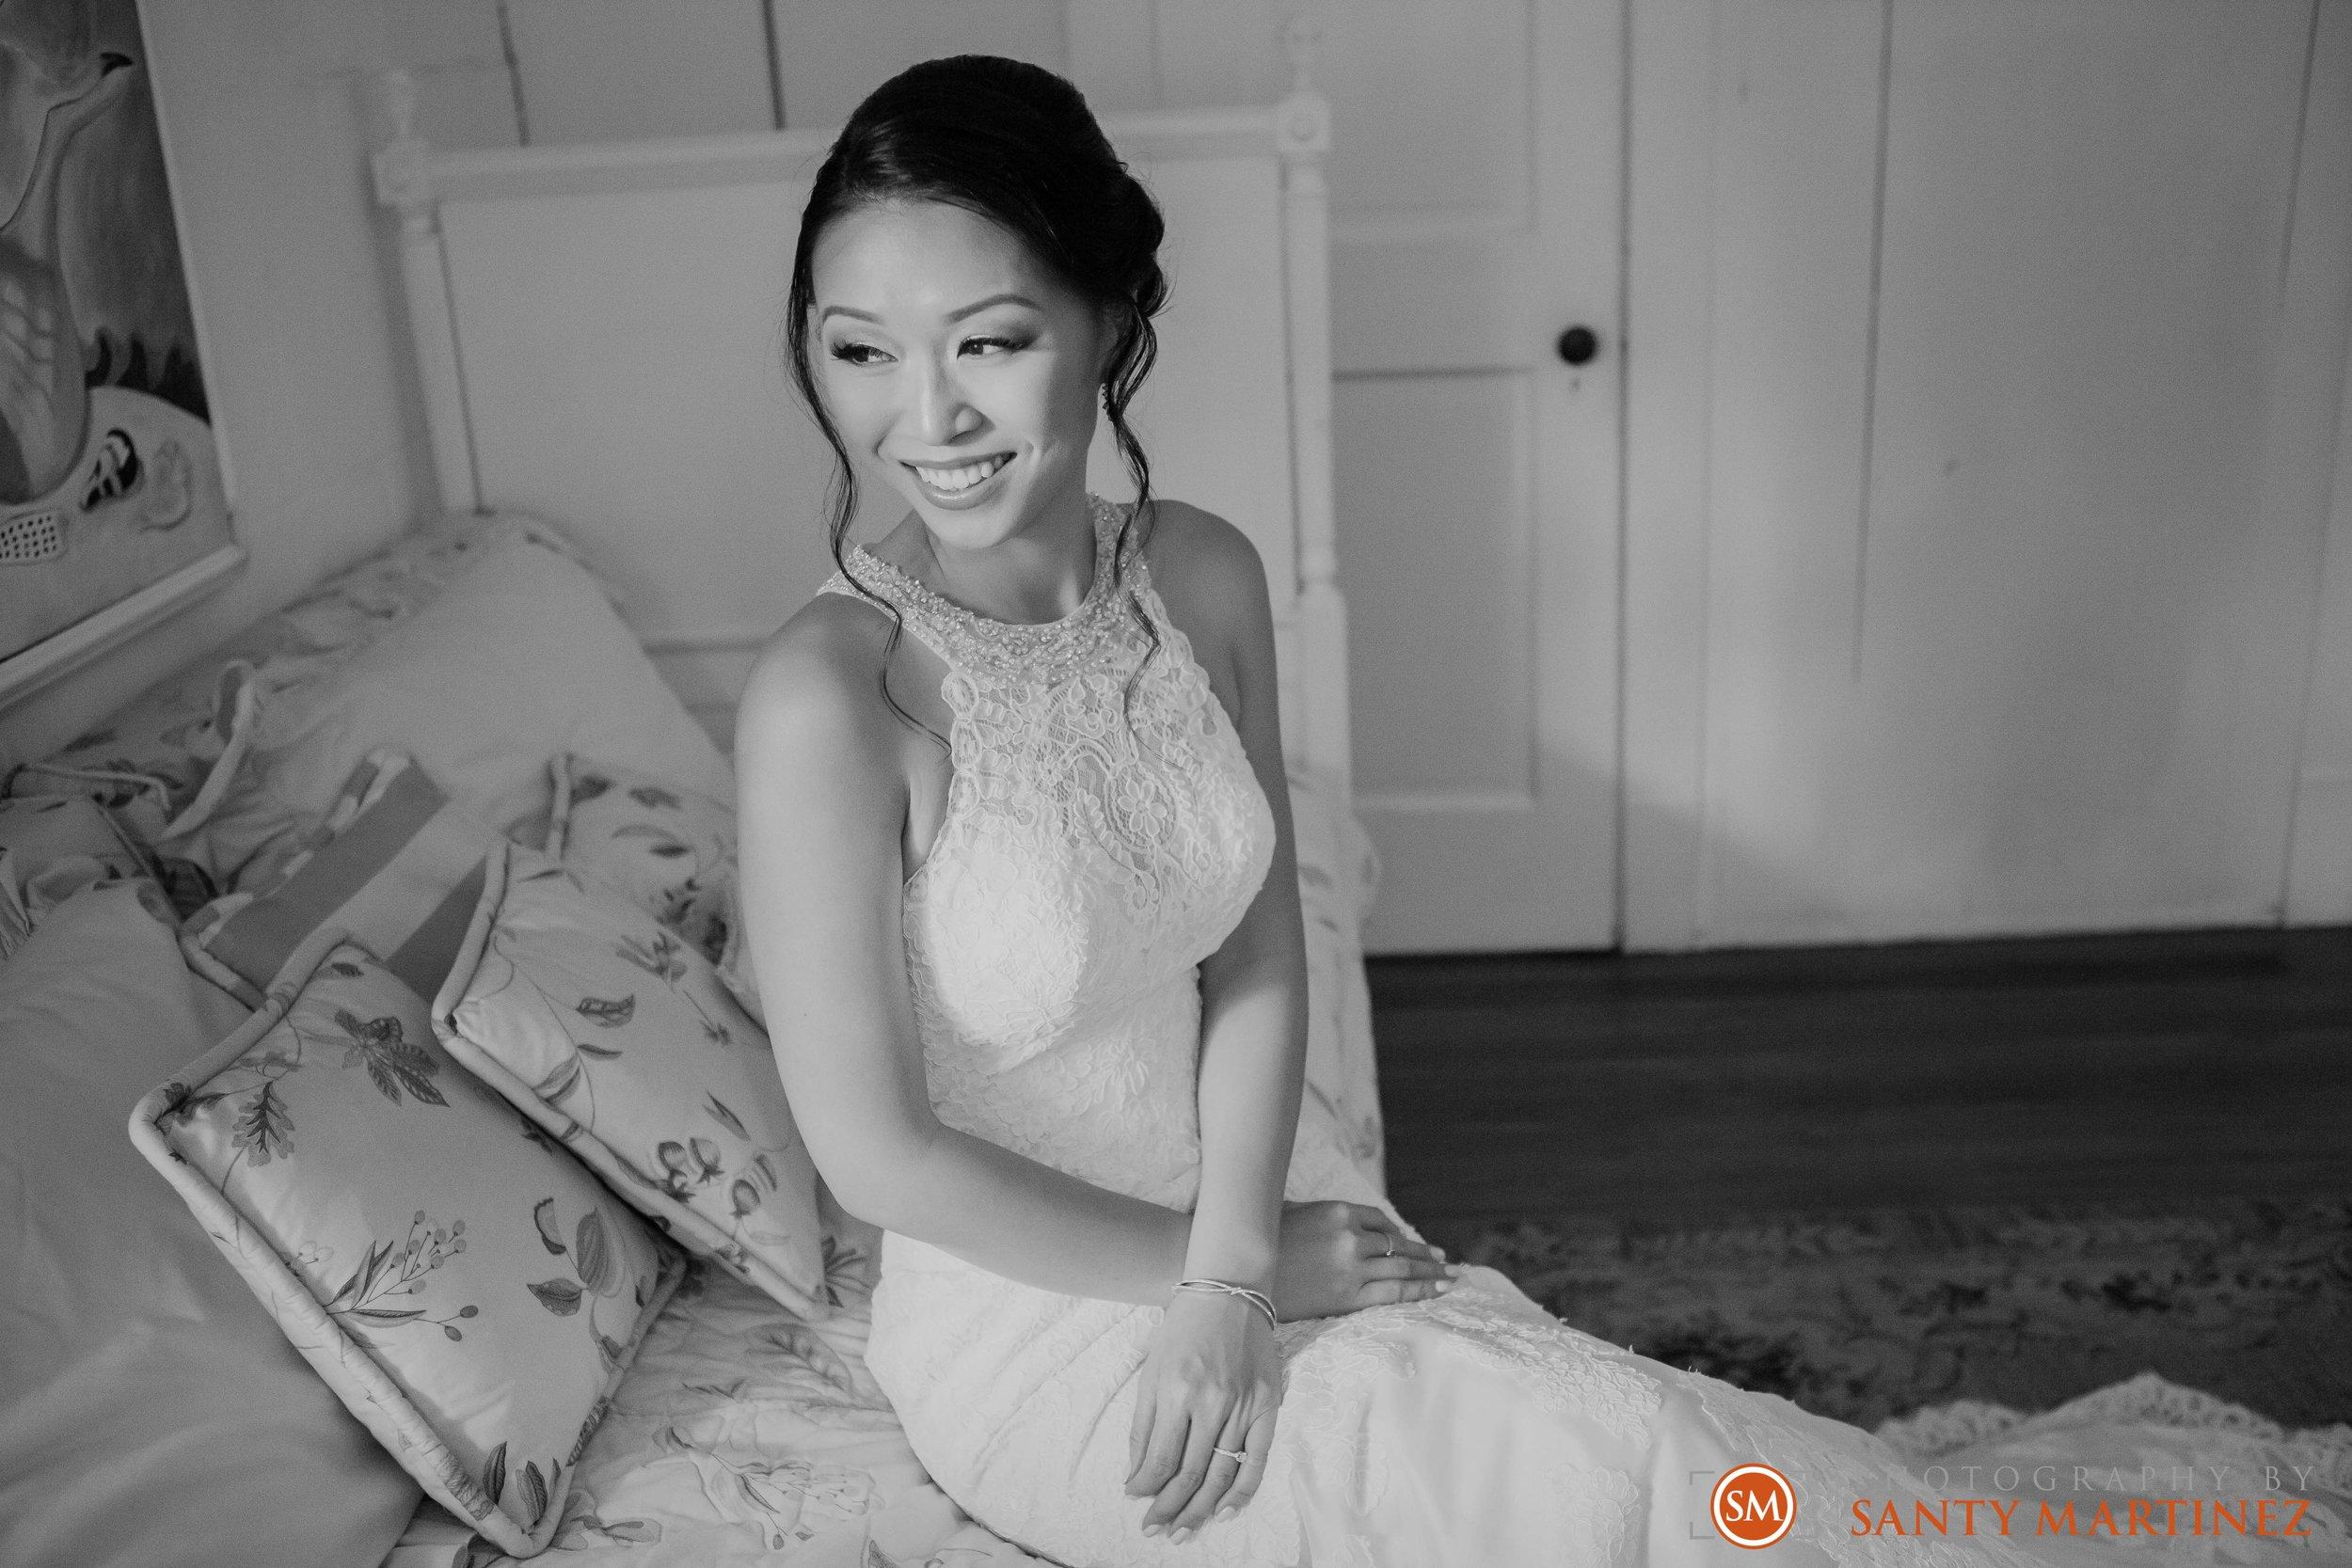 Wedding Bonnet House - Photography by Santy Martinez-7.jpg